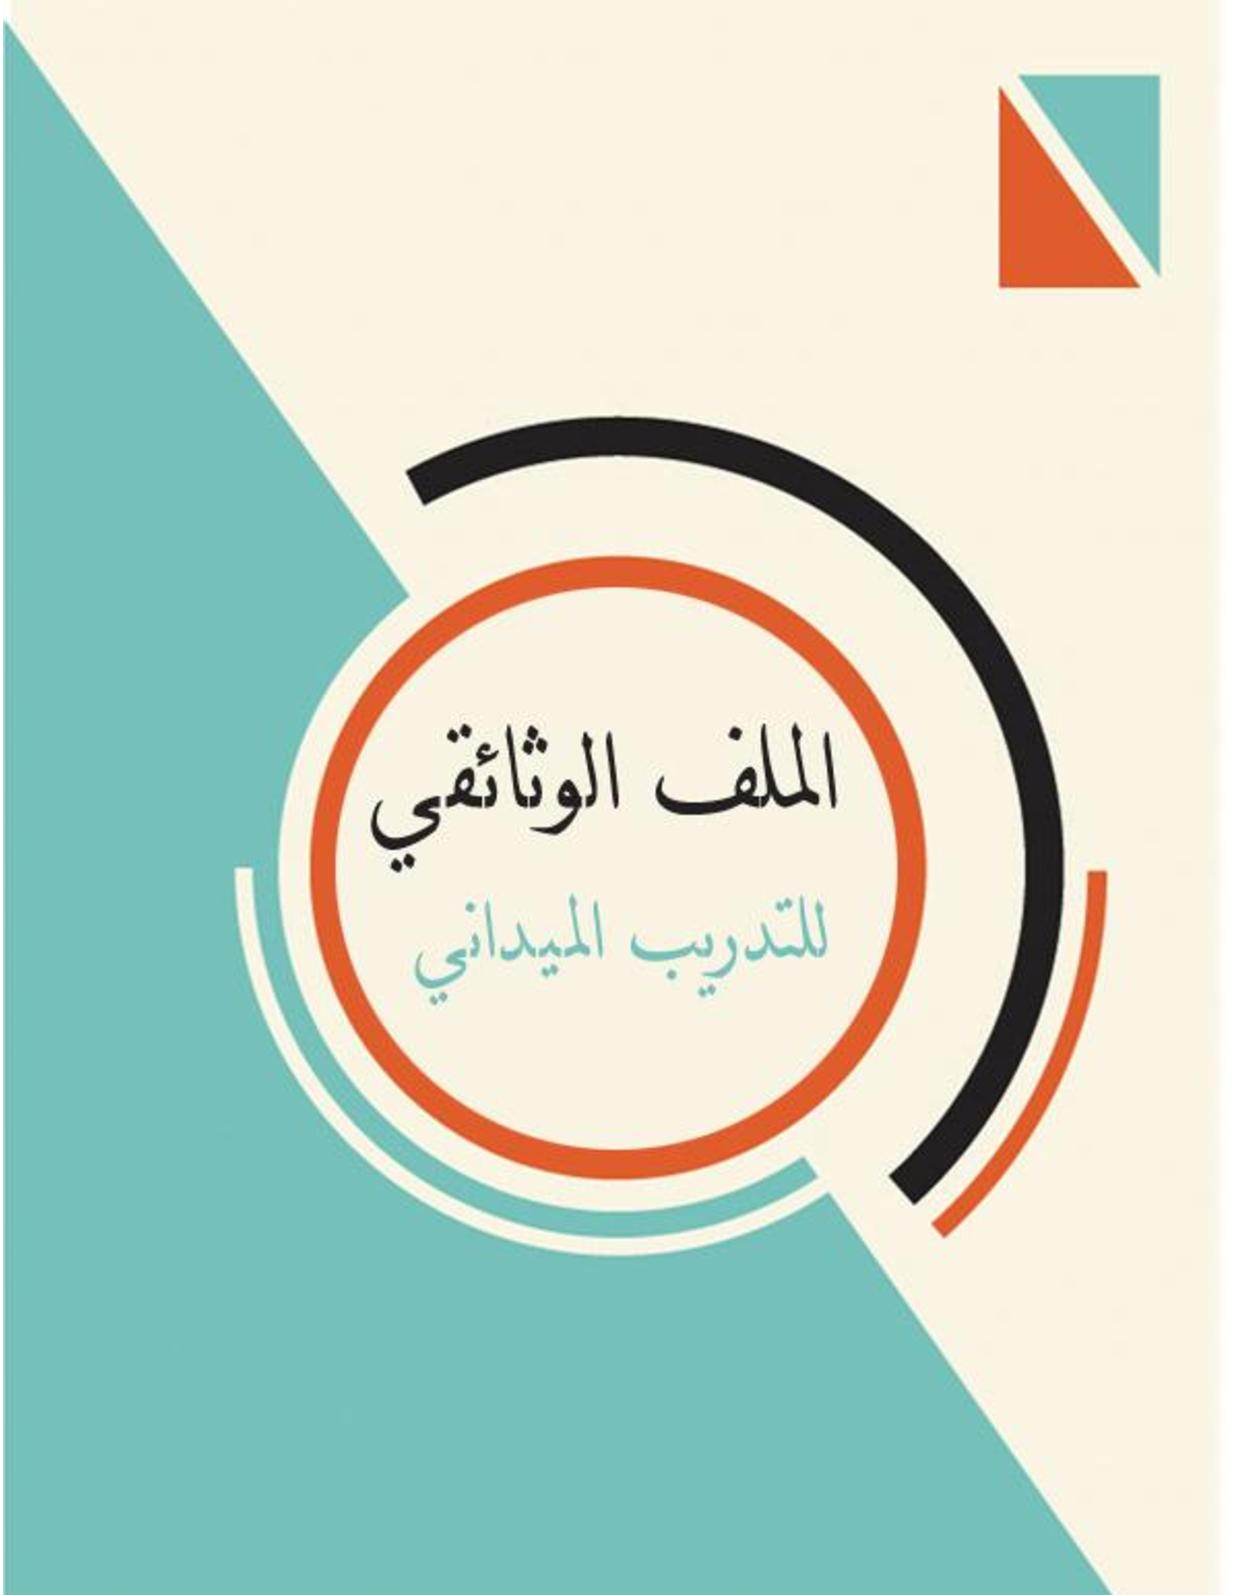 6ec9dadf3 Calaméo - ملف التدريب الميداني للطالبة فاطمة الزيدية 20162017